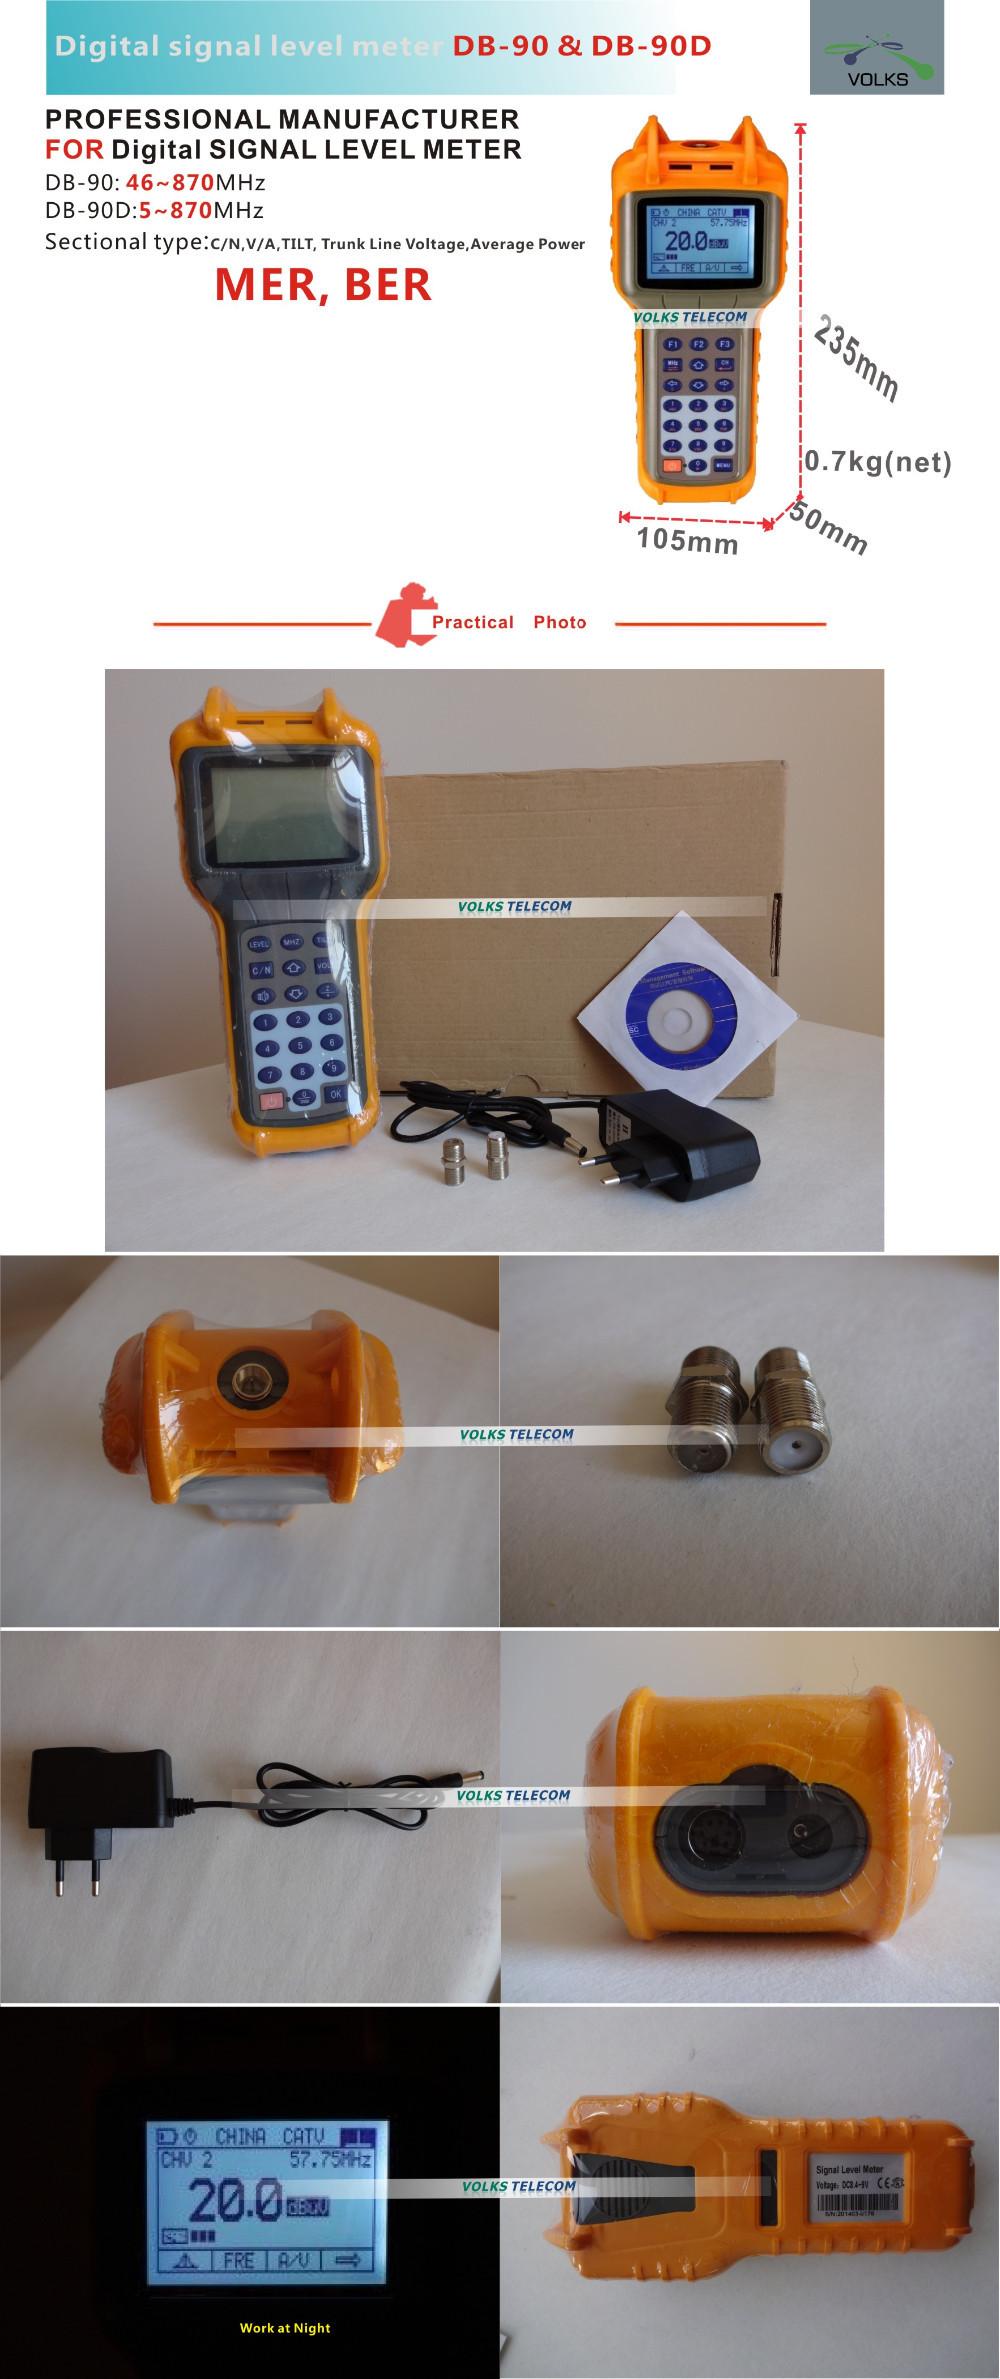 QAM CATV Digital MER, BER Signal Level Meter